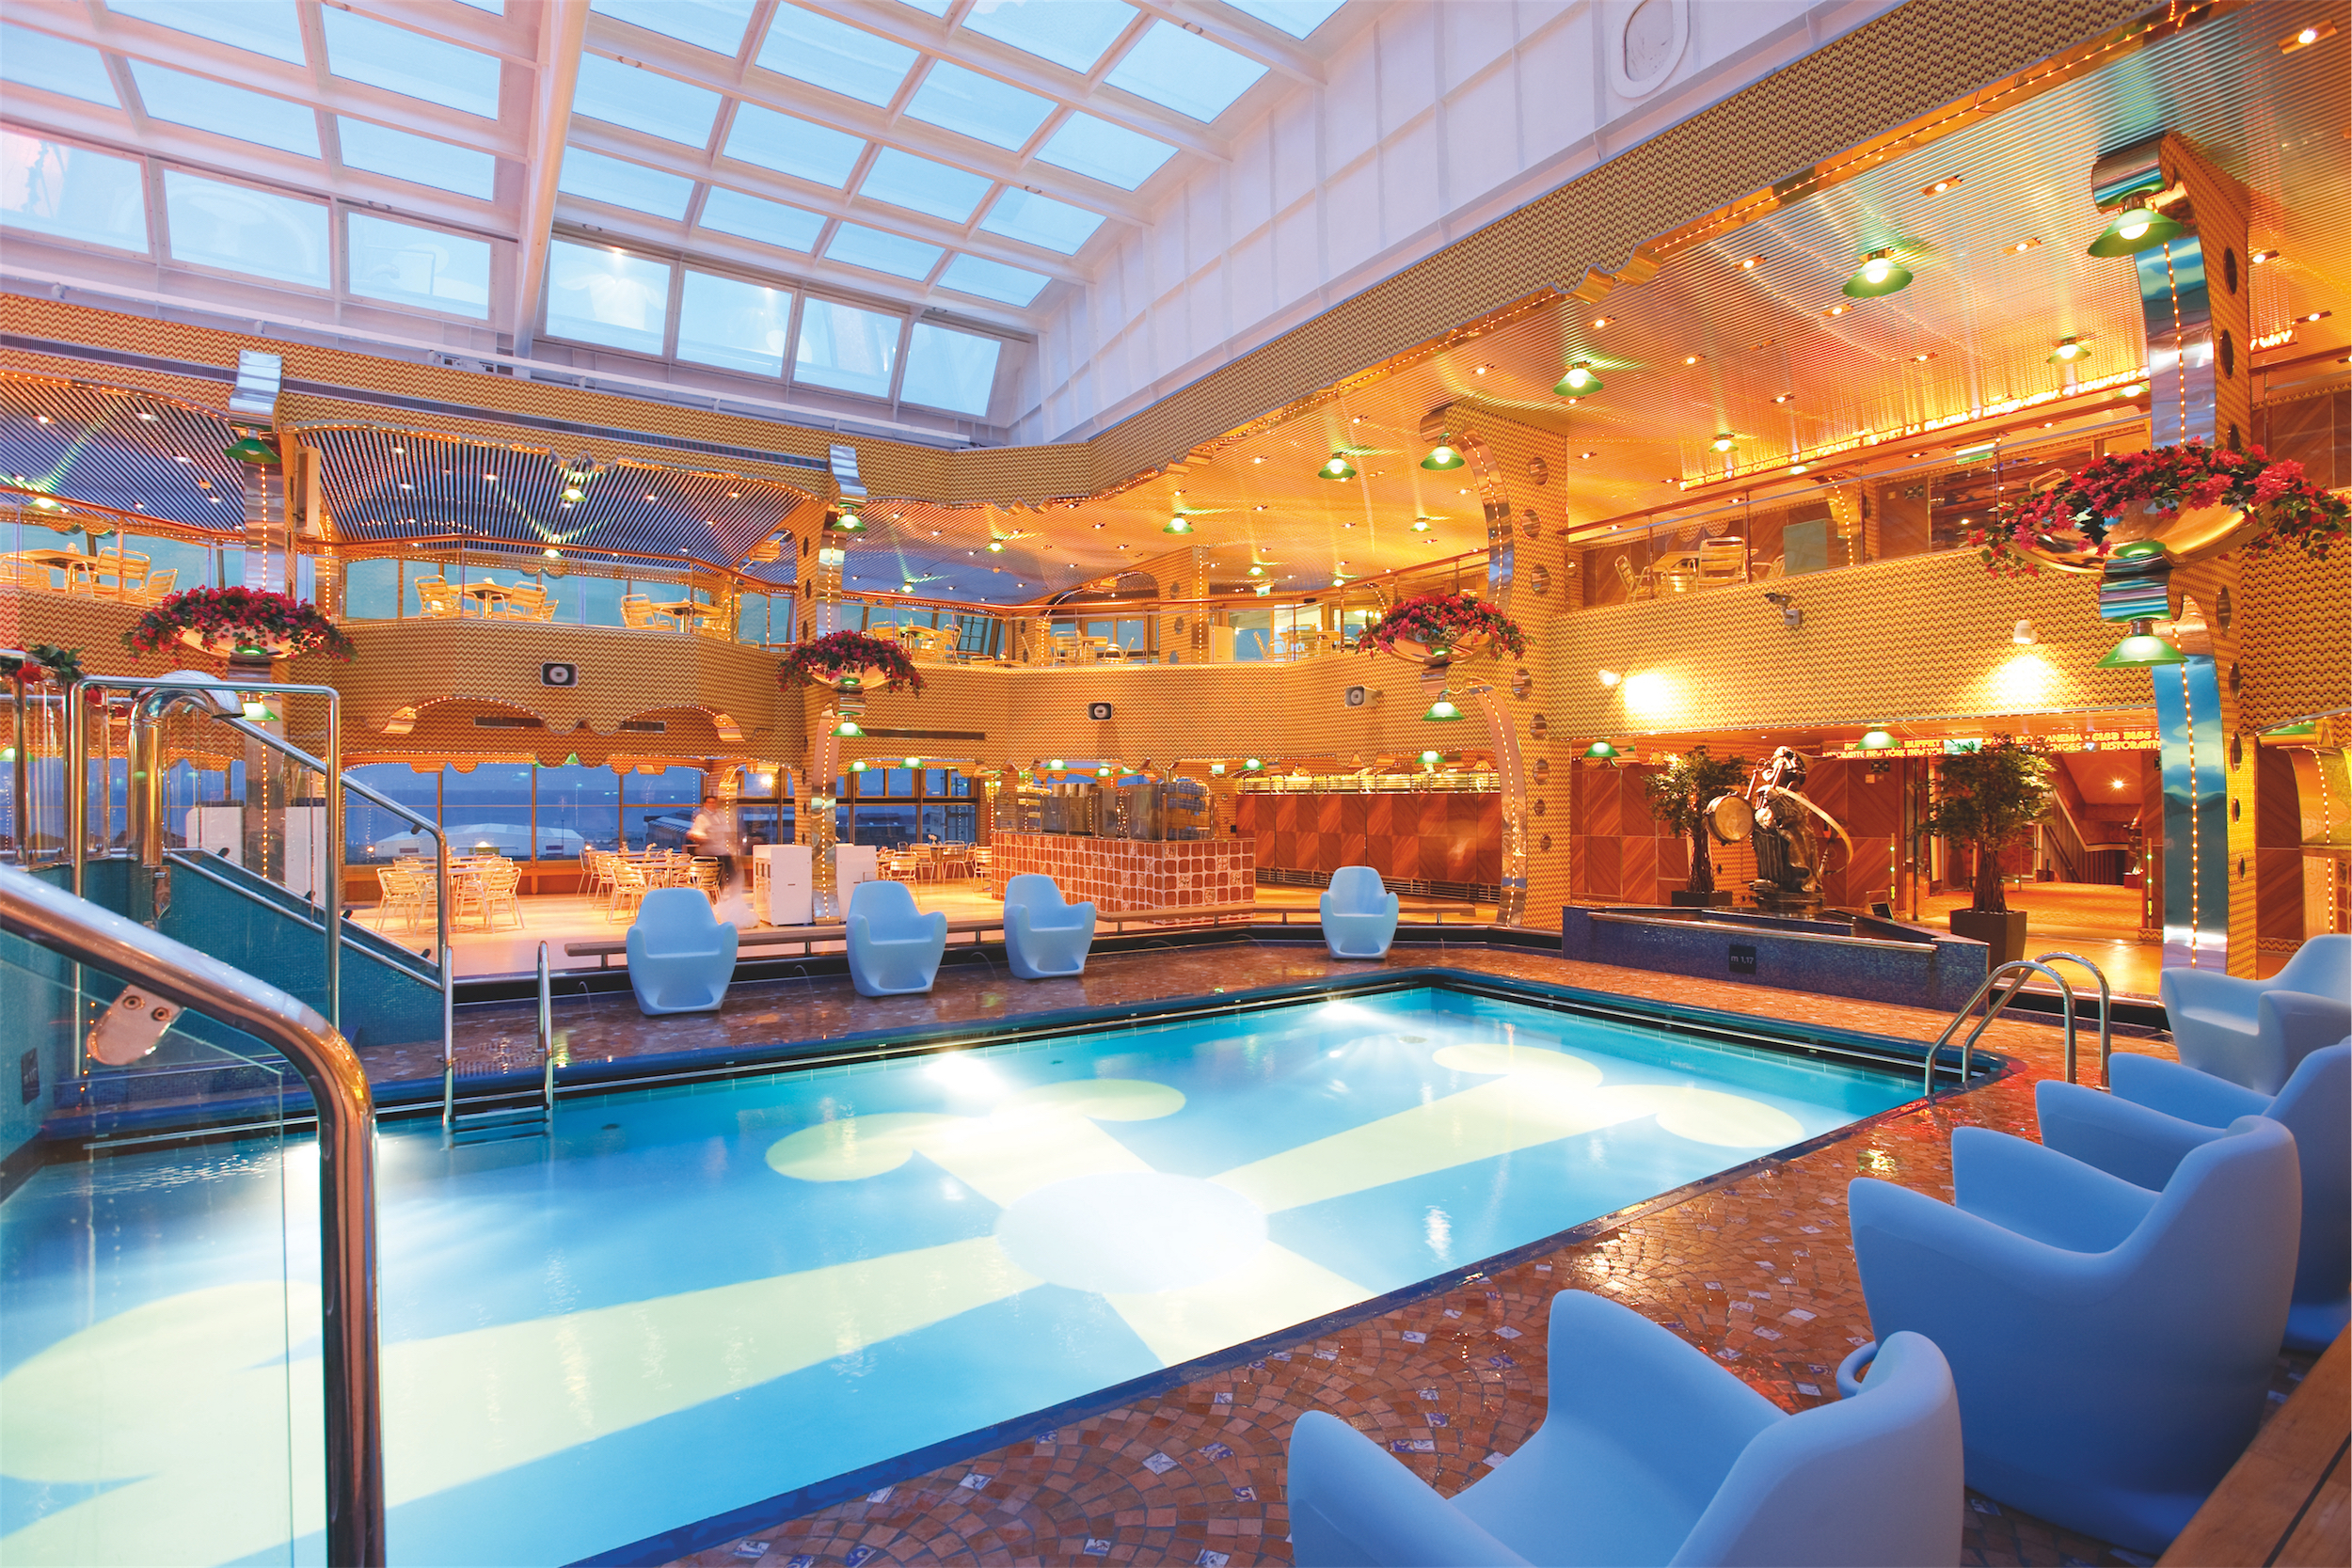 Costa Cruises Costa Pacifica Exterior Swimming Pool 3.JPG